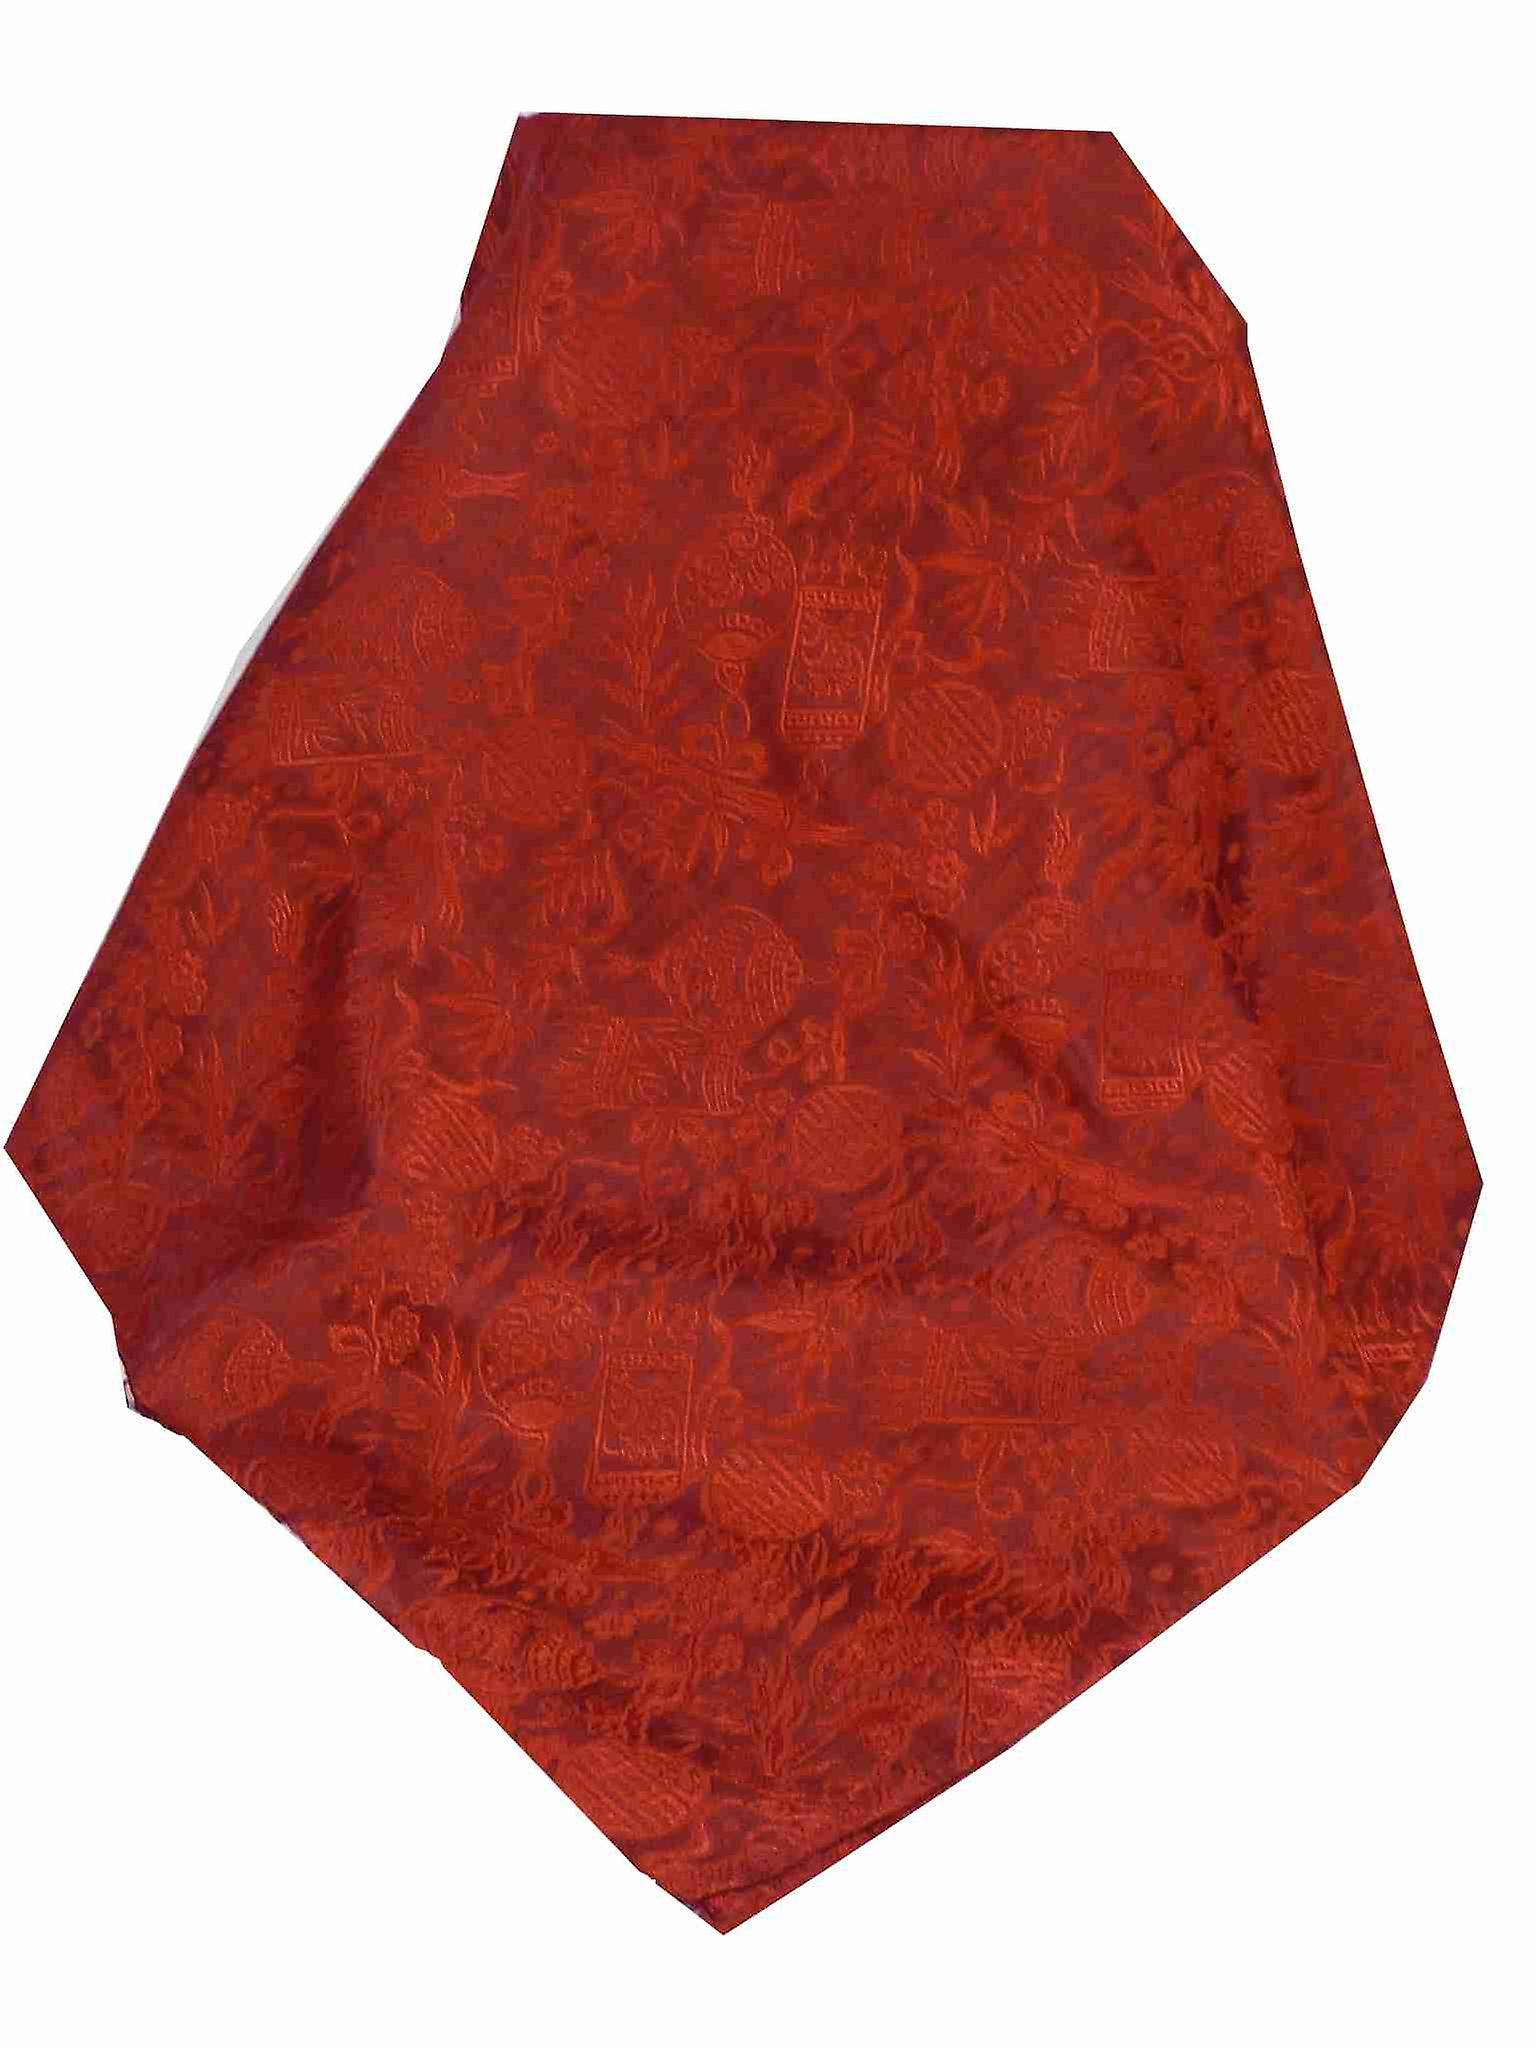 Vietnamese Silk Scarf Reversible Hoi-An Ha-Long Ruby by Pashmina & Silk